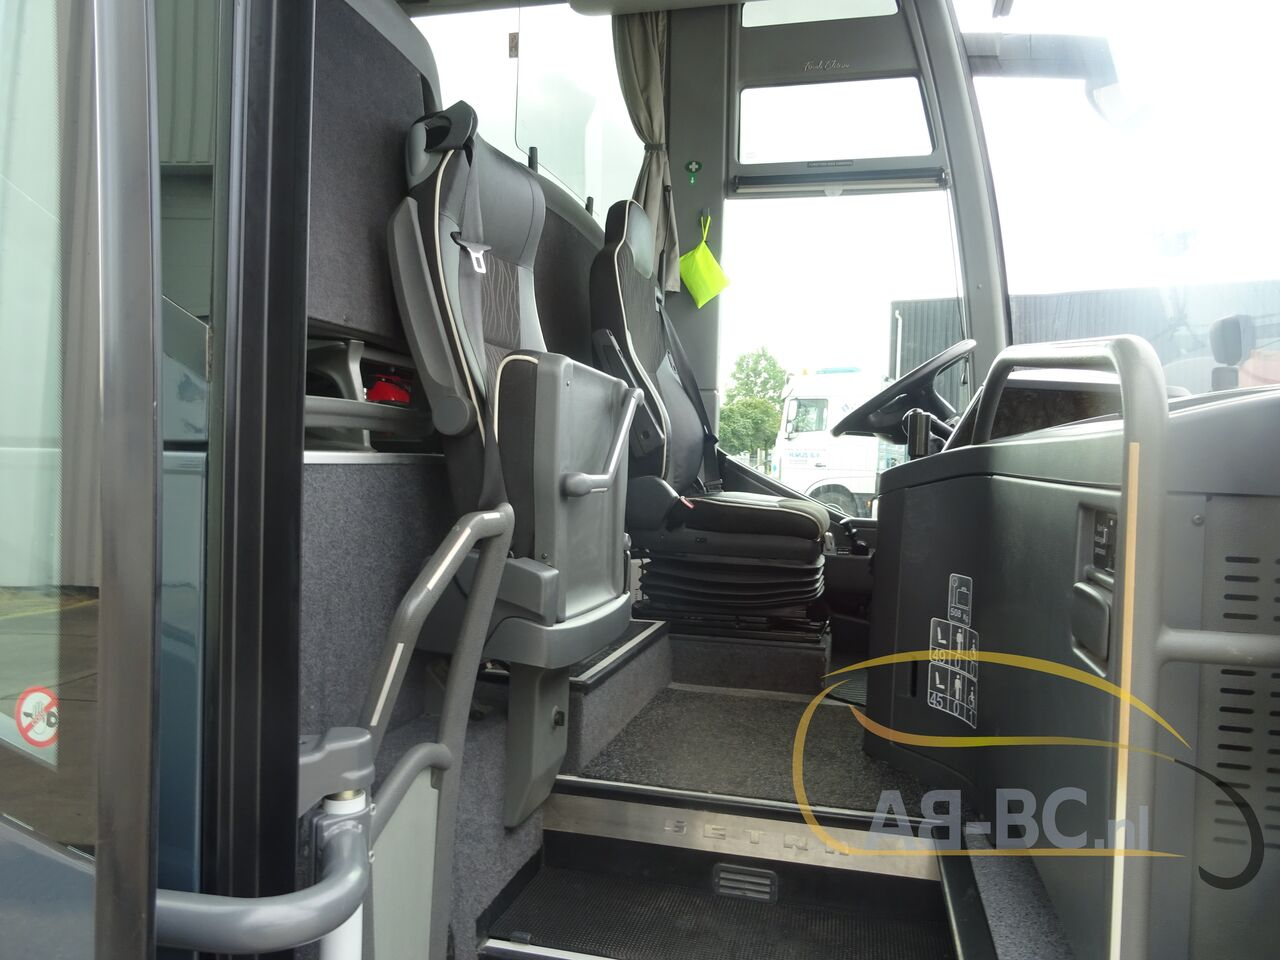 coach-busSETRA-S415-GT-HD-FINAL-EDITION---1627457055726545562_big_d54d4499c2d866e8008db9a4070cad72--21050713010665719300